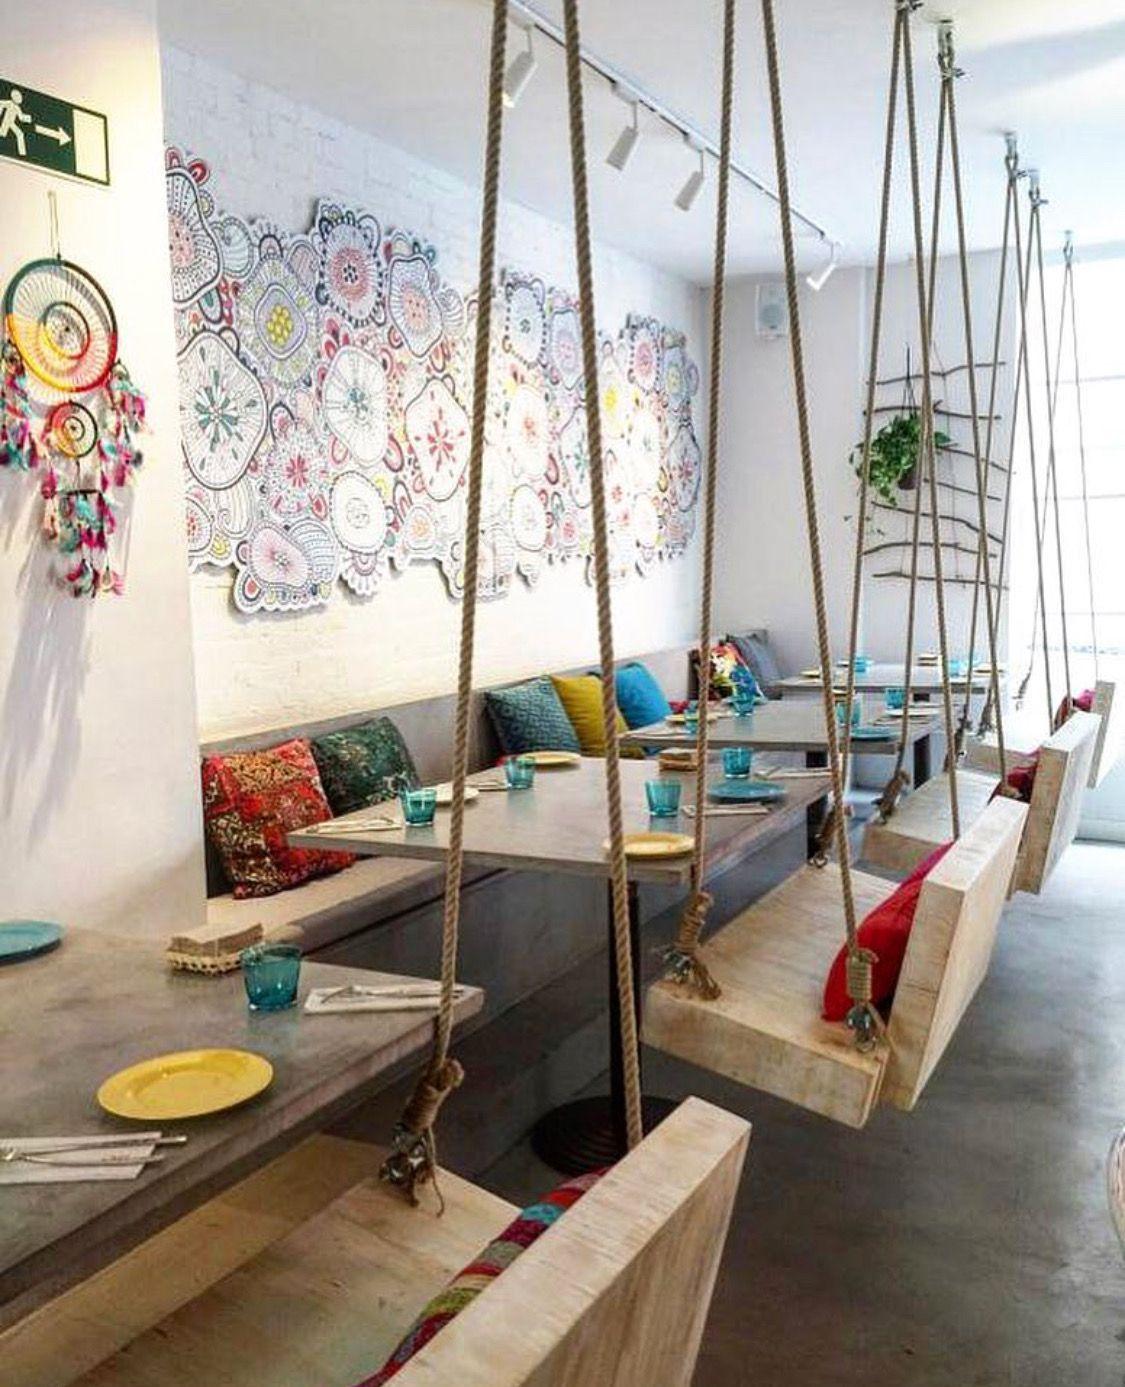 Pin De Archikron En Restaurant Bistro Pinterest Dise O De  # Muebles Heladeria